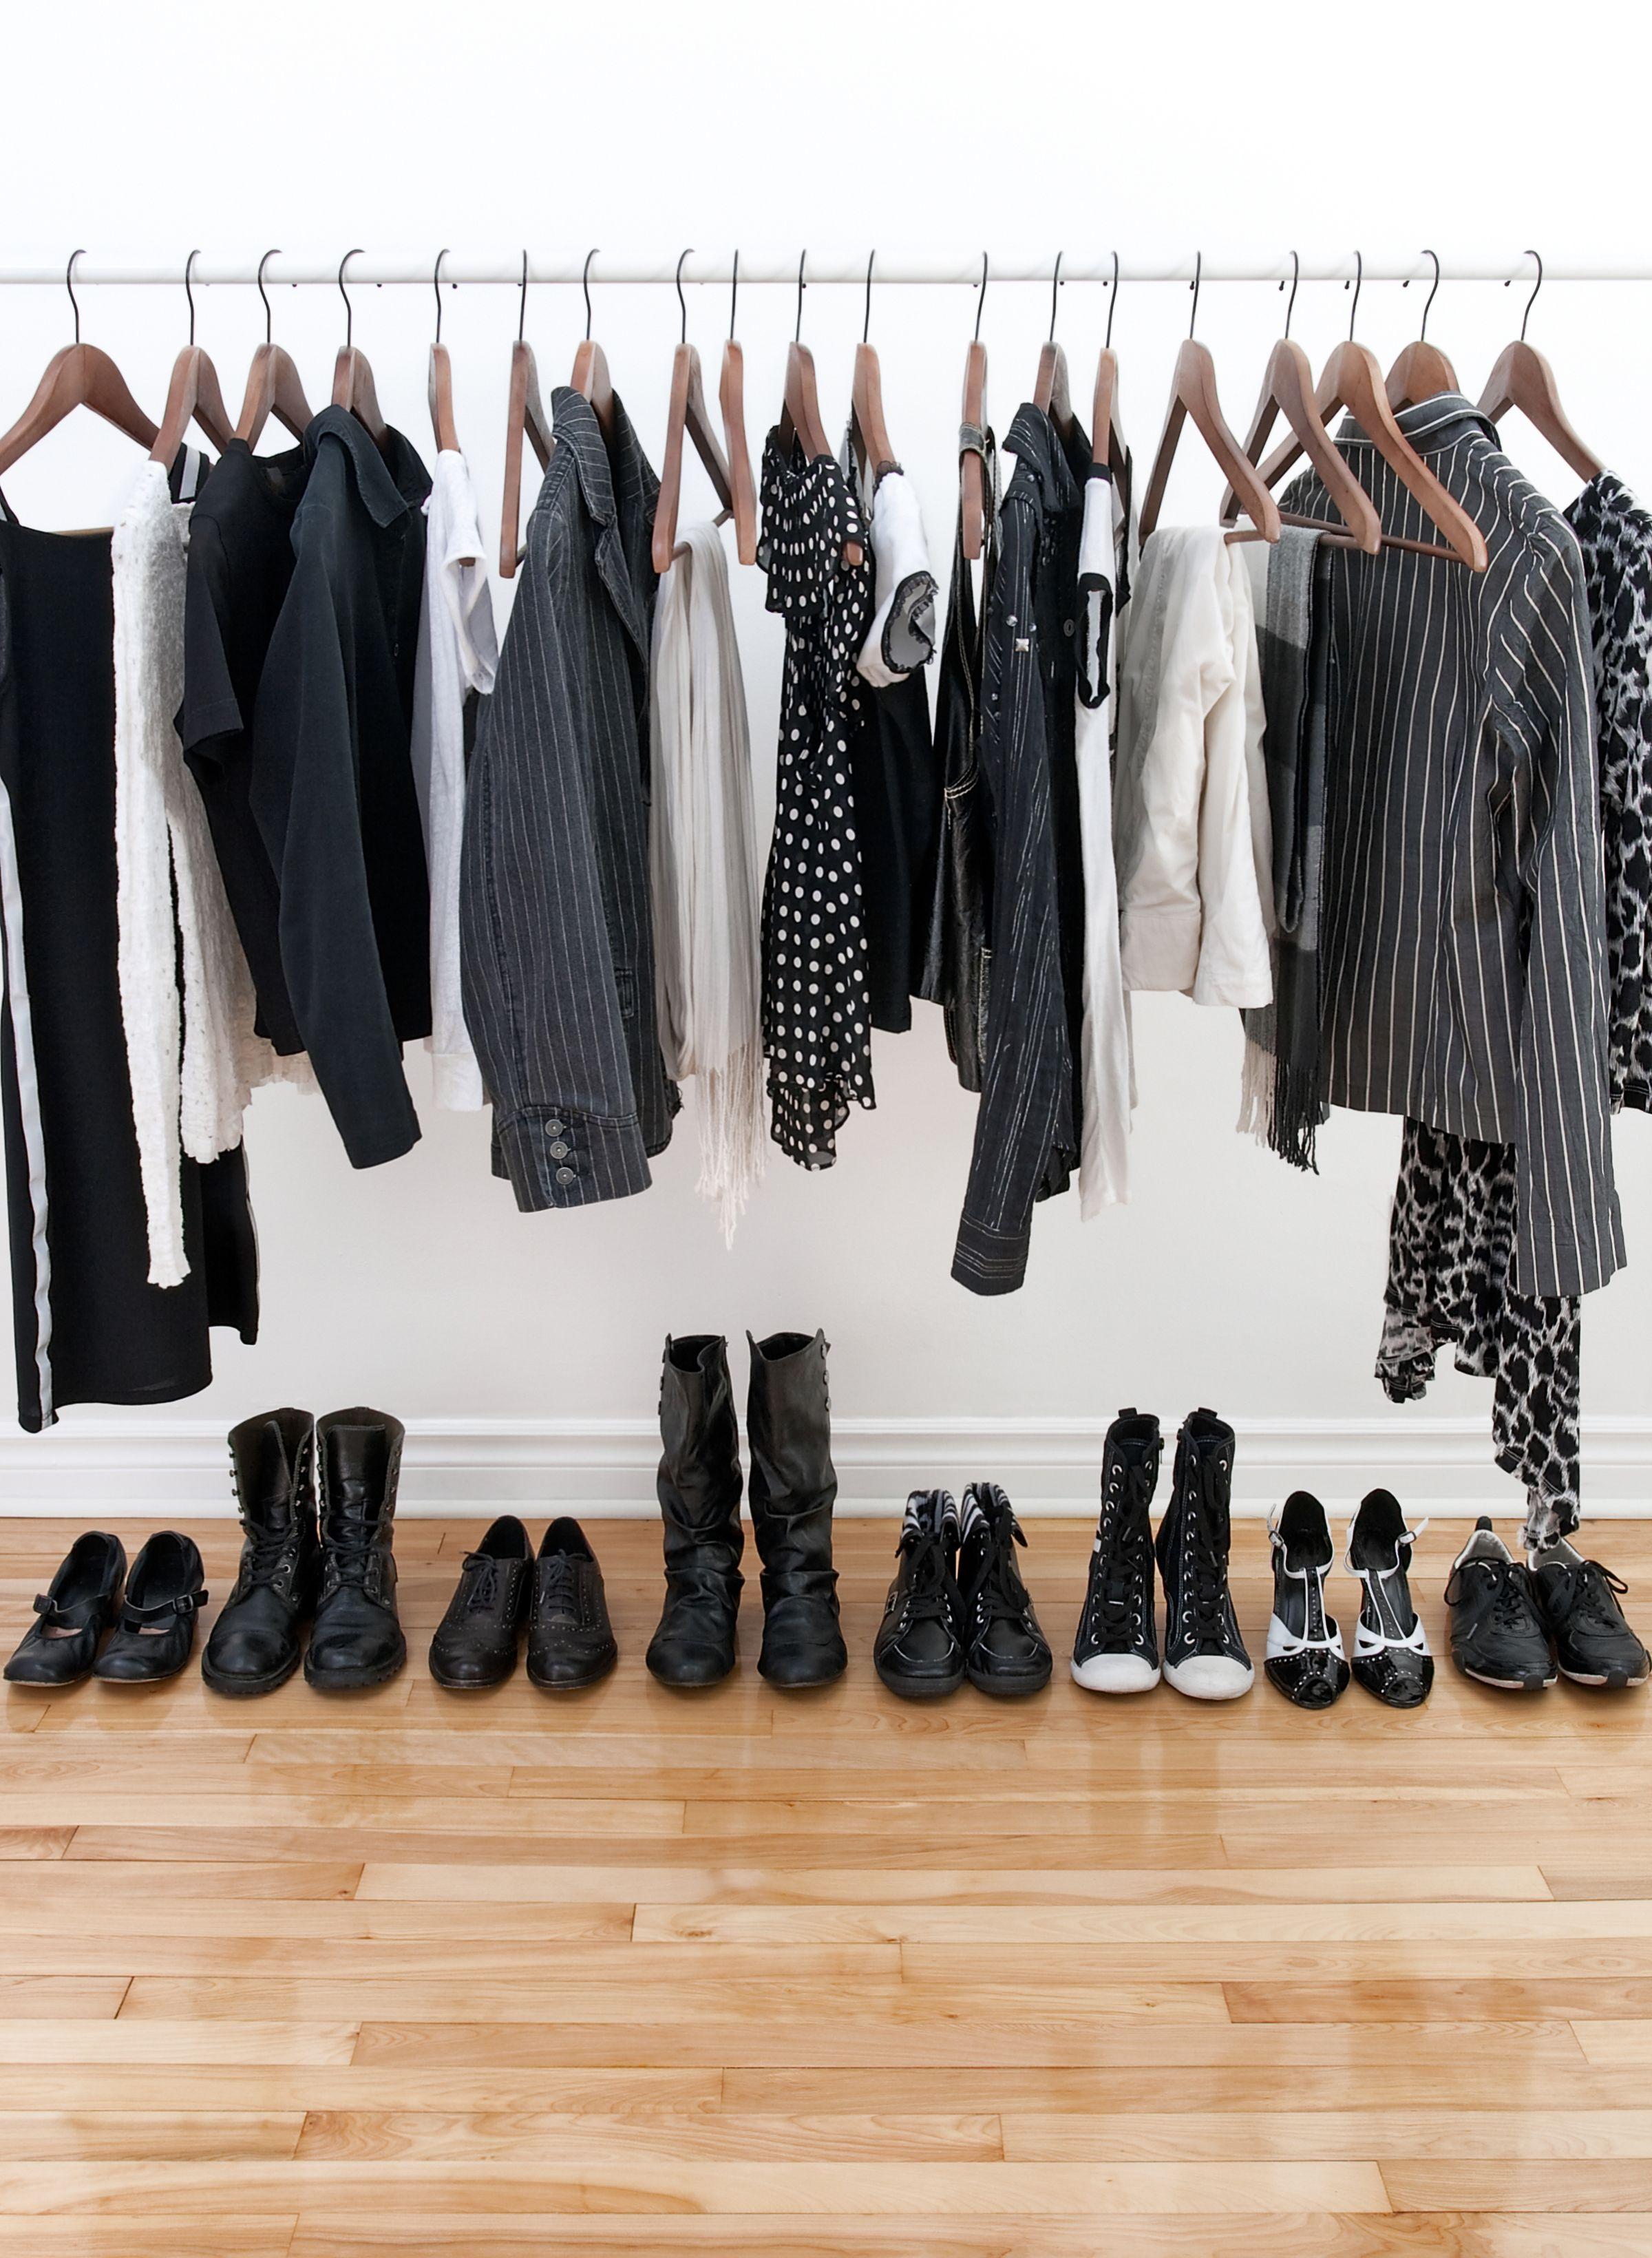 Room Organization Garment Rack